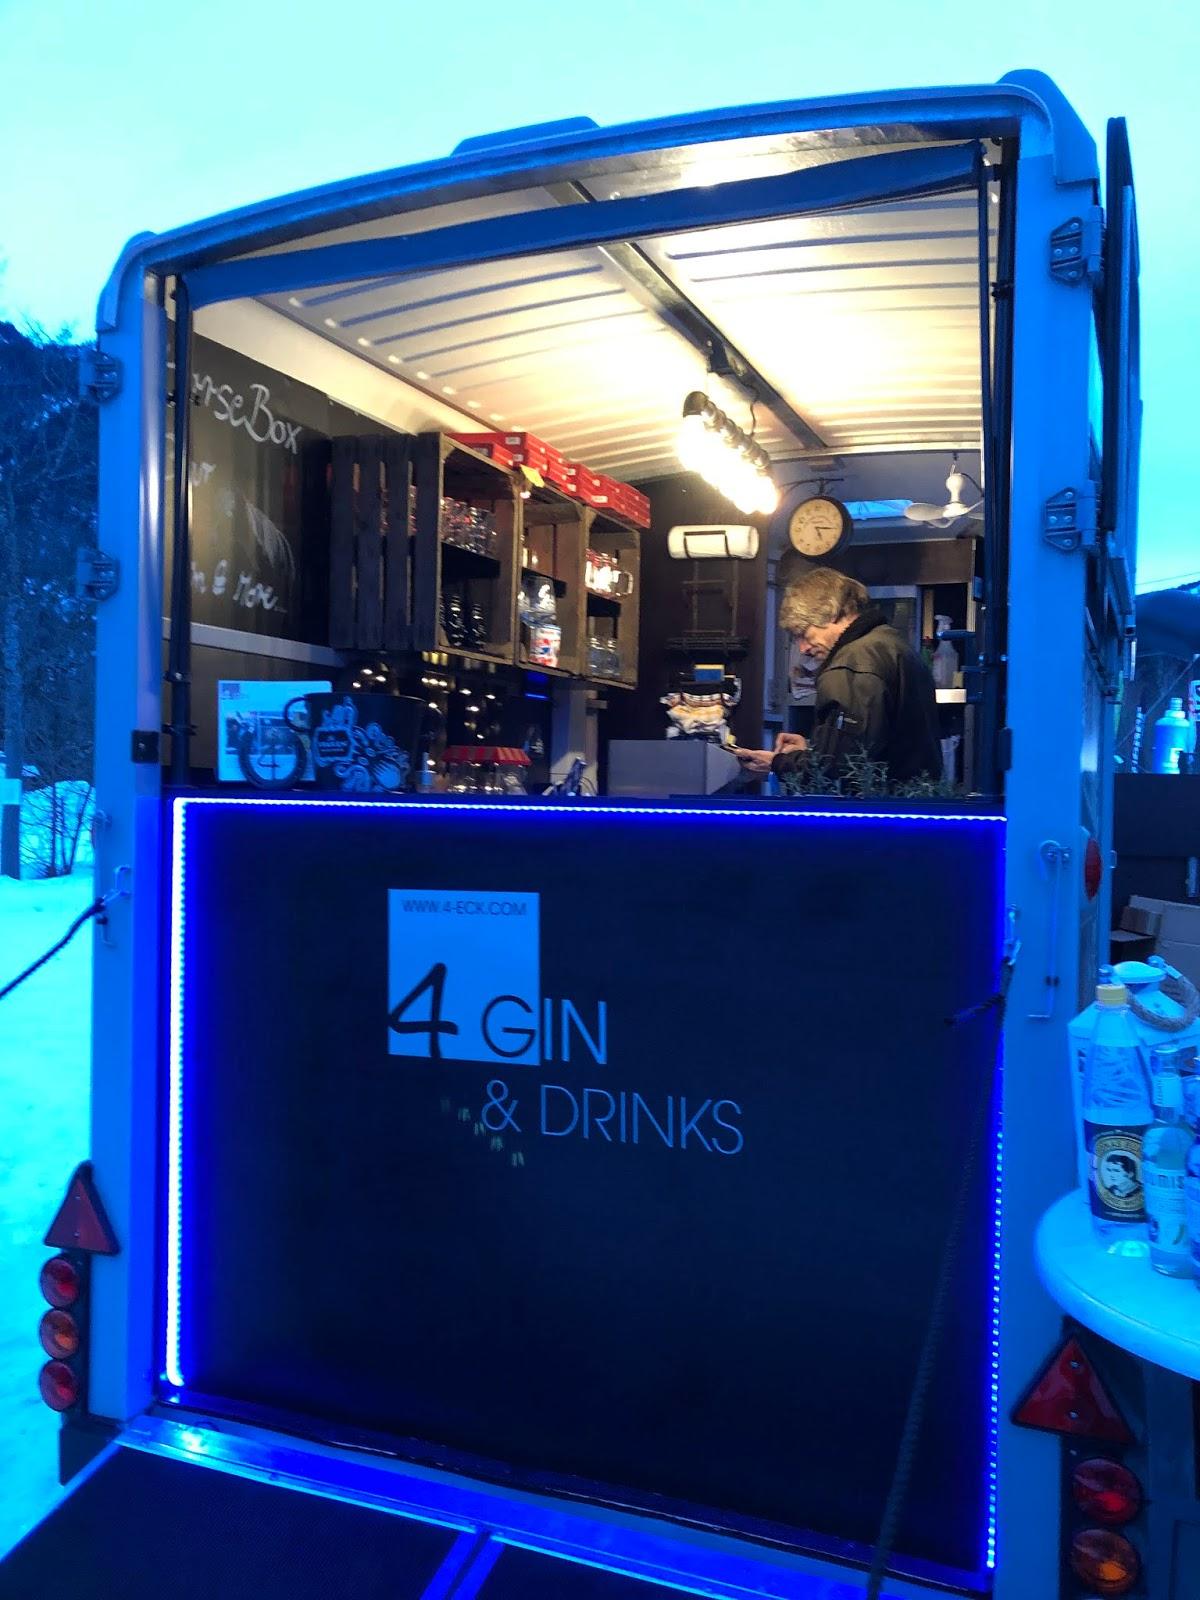 4 Gin and Drinks, Horseboxbar, Event-Bar, mobile Bar, Bayern, Garmisch-Partenkirchen, Gin-Bar, Oberammergau, König-Ludwig-Lauf by Uschi Glas 4 weddings and events